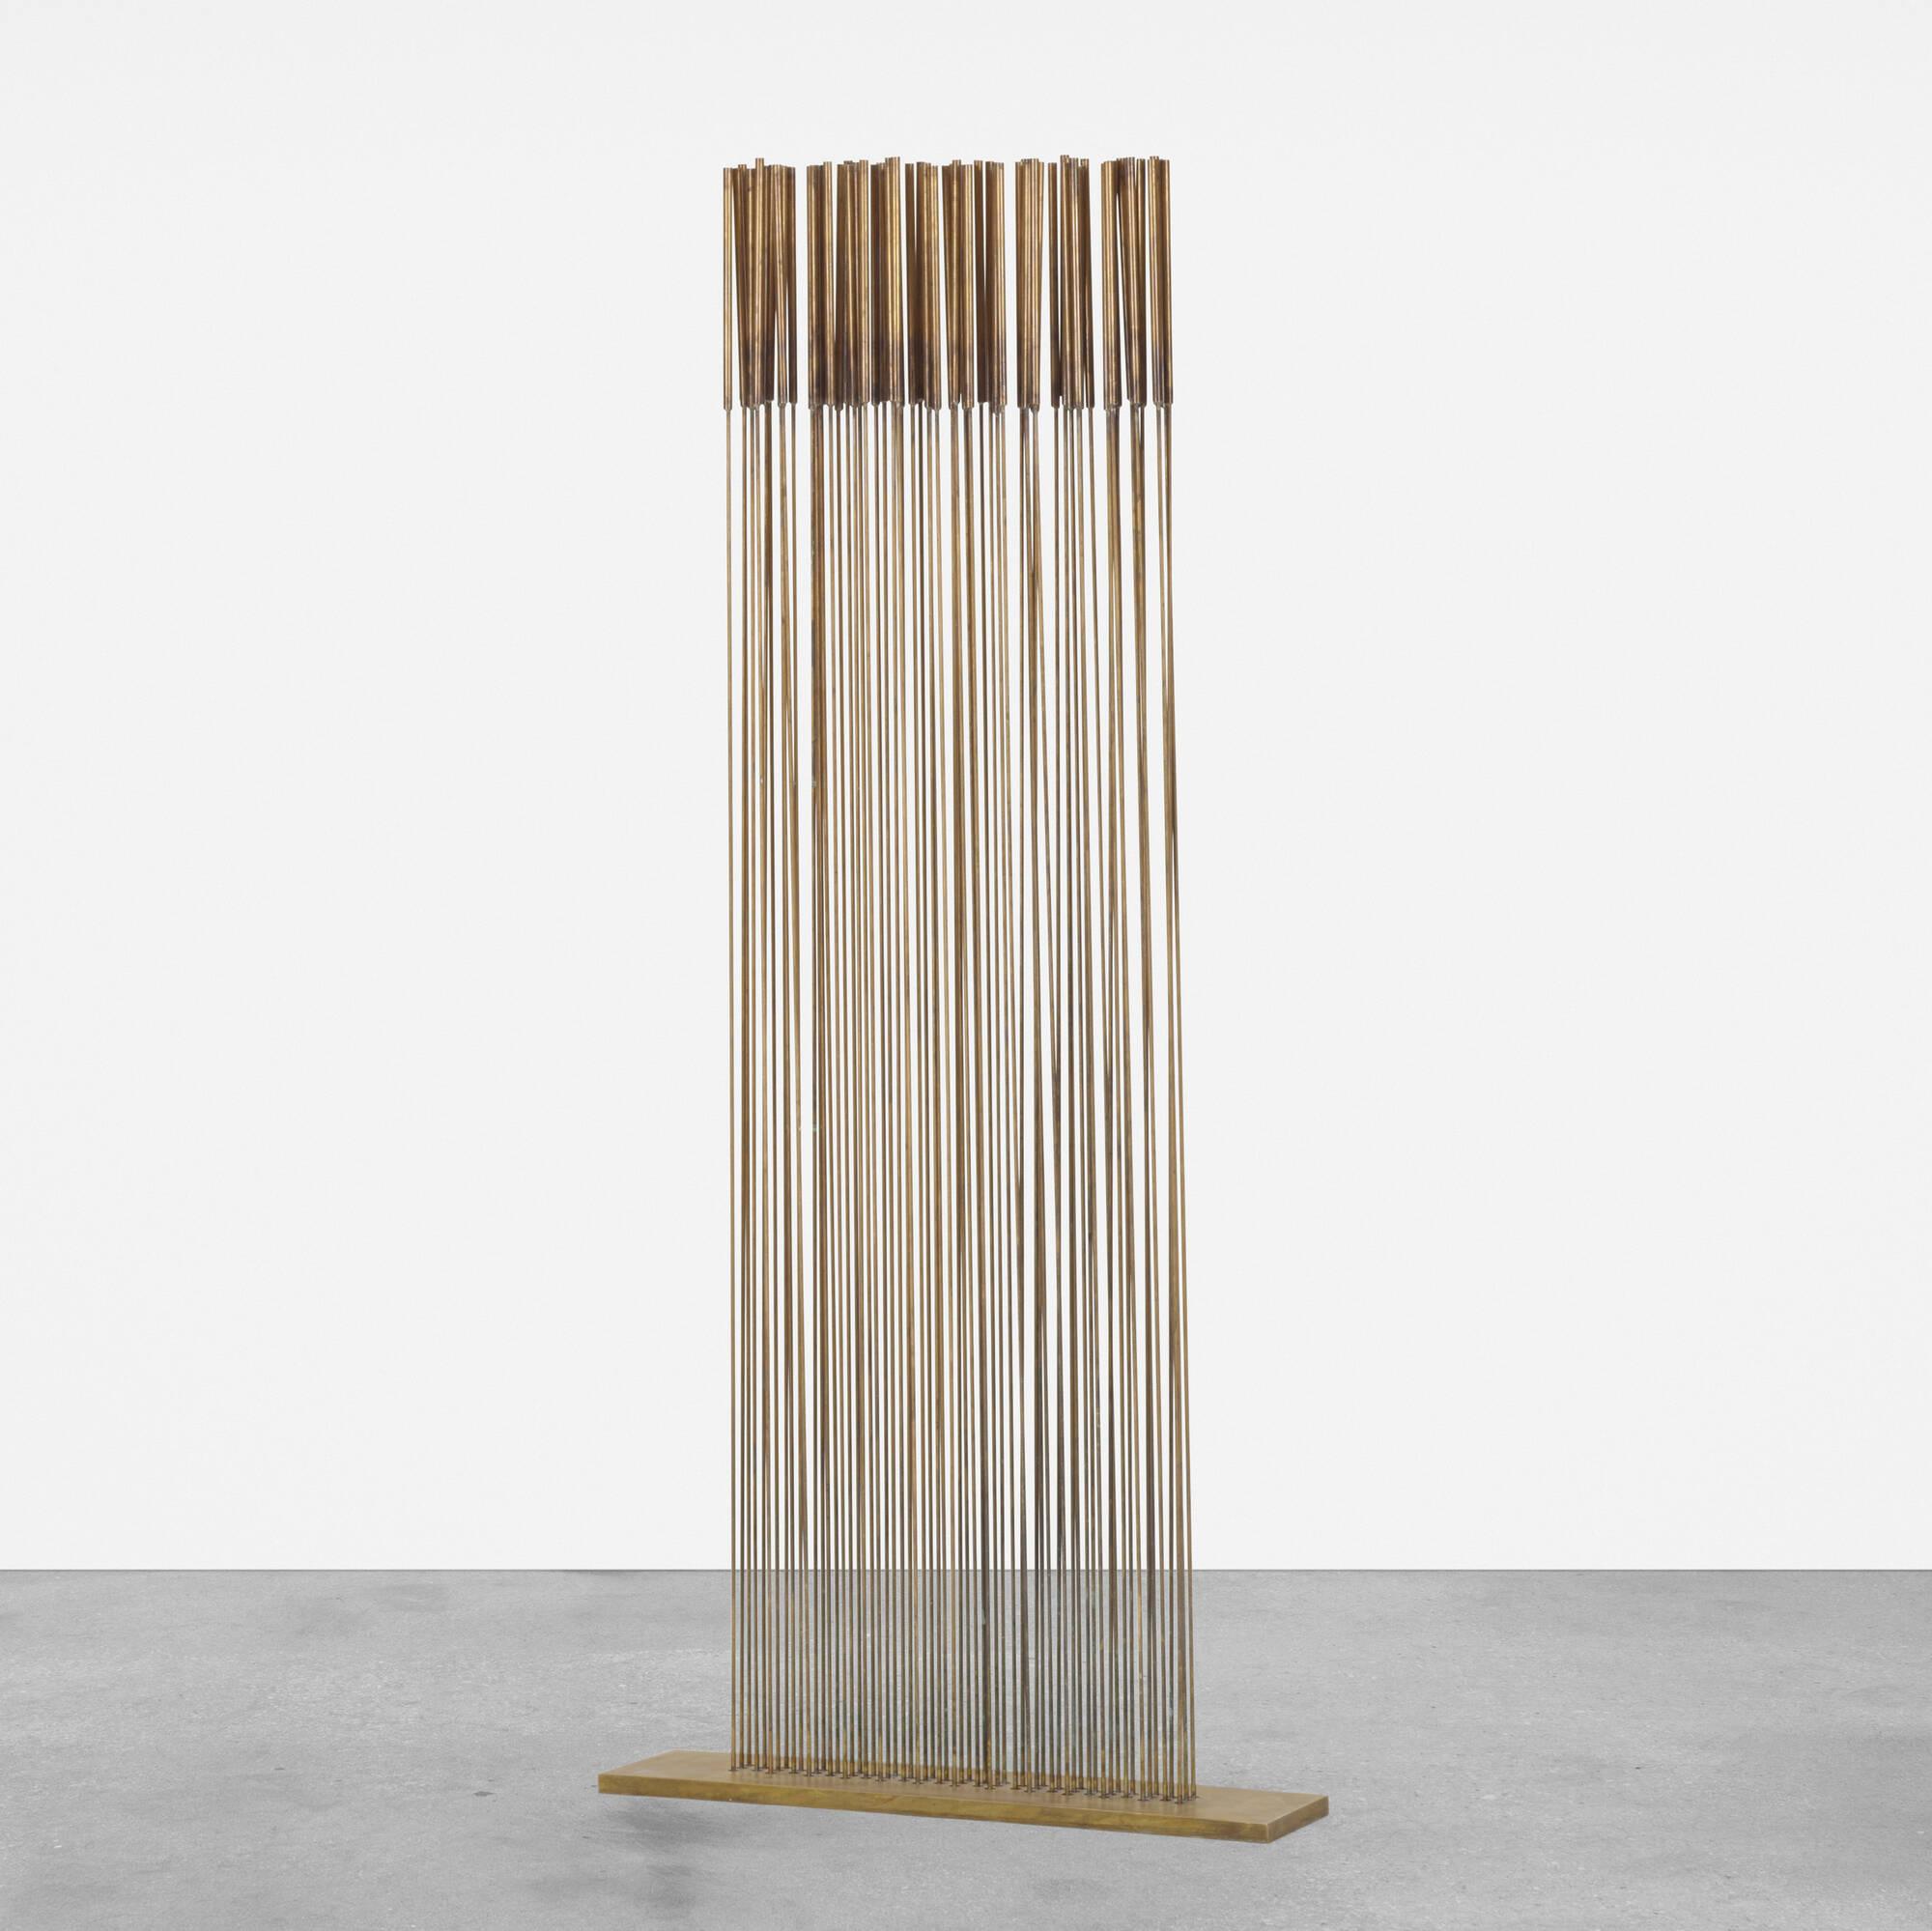 187: Harry Bertoia / Untitled (Sonambient) (1 of 3)